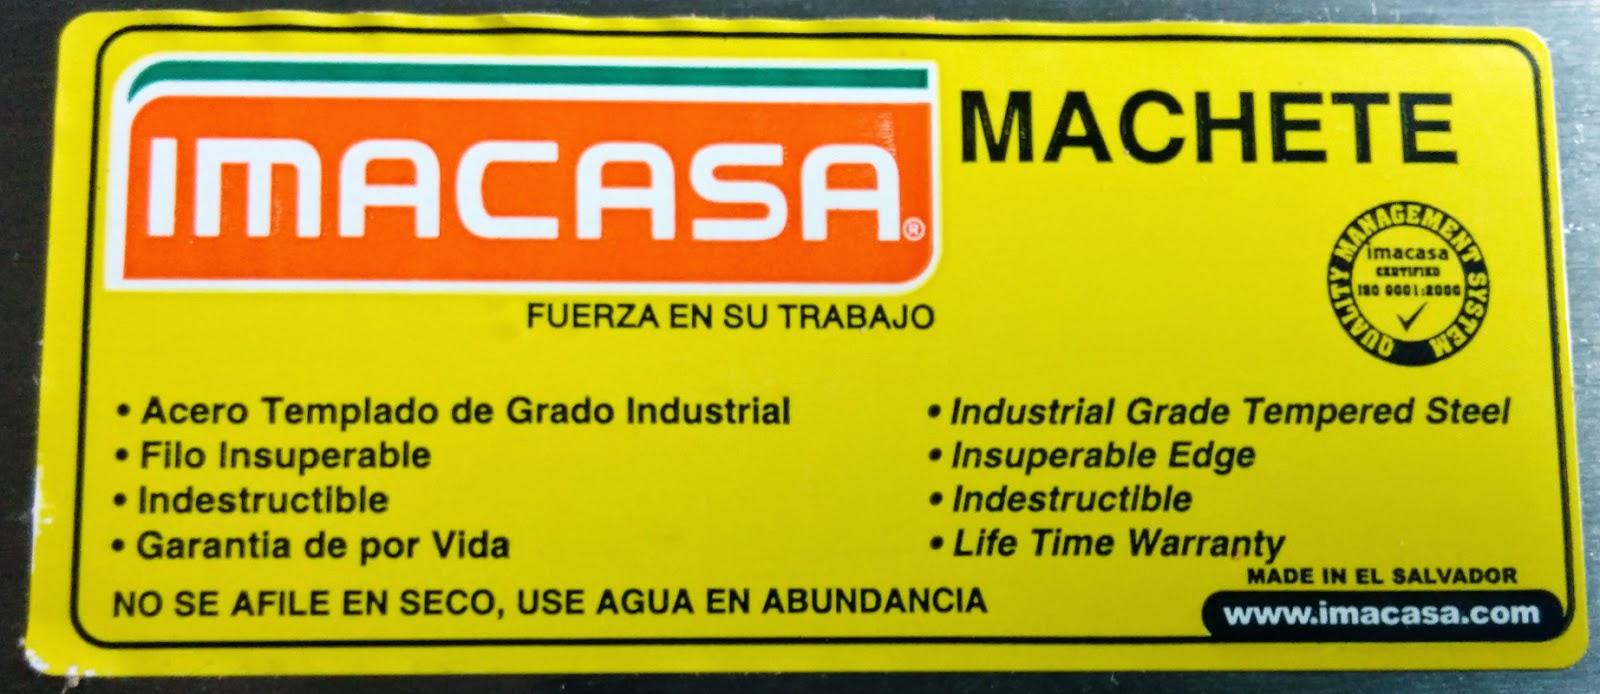 imacasa quality machete